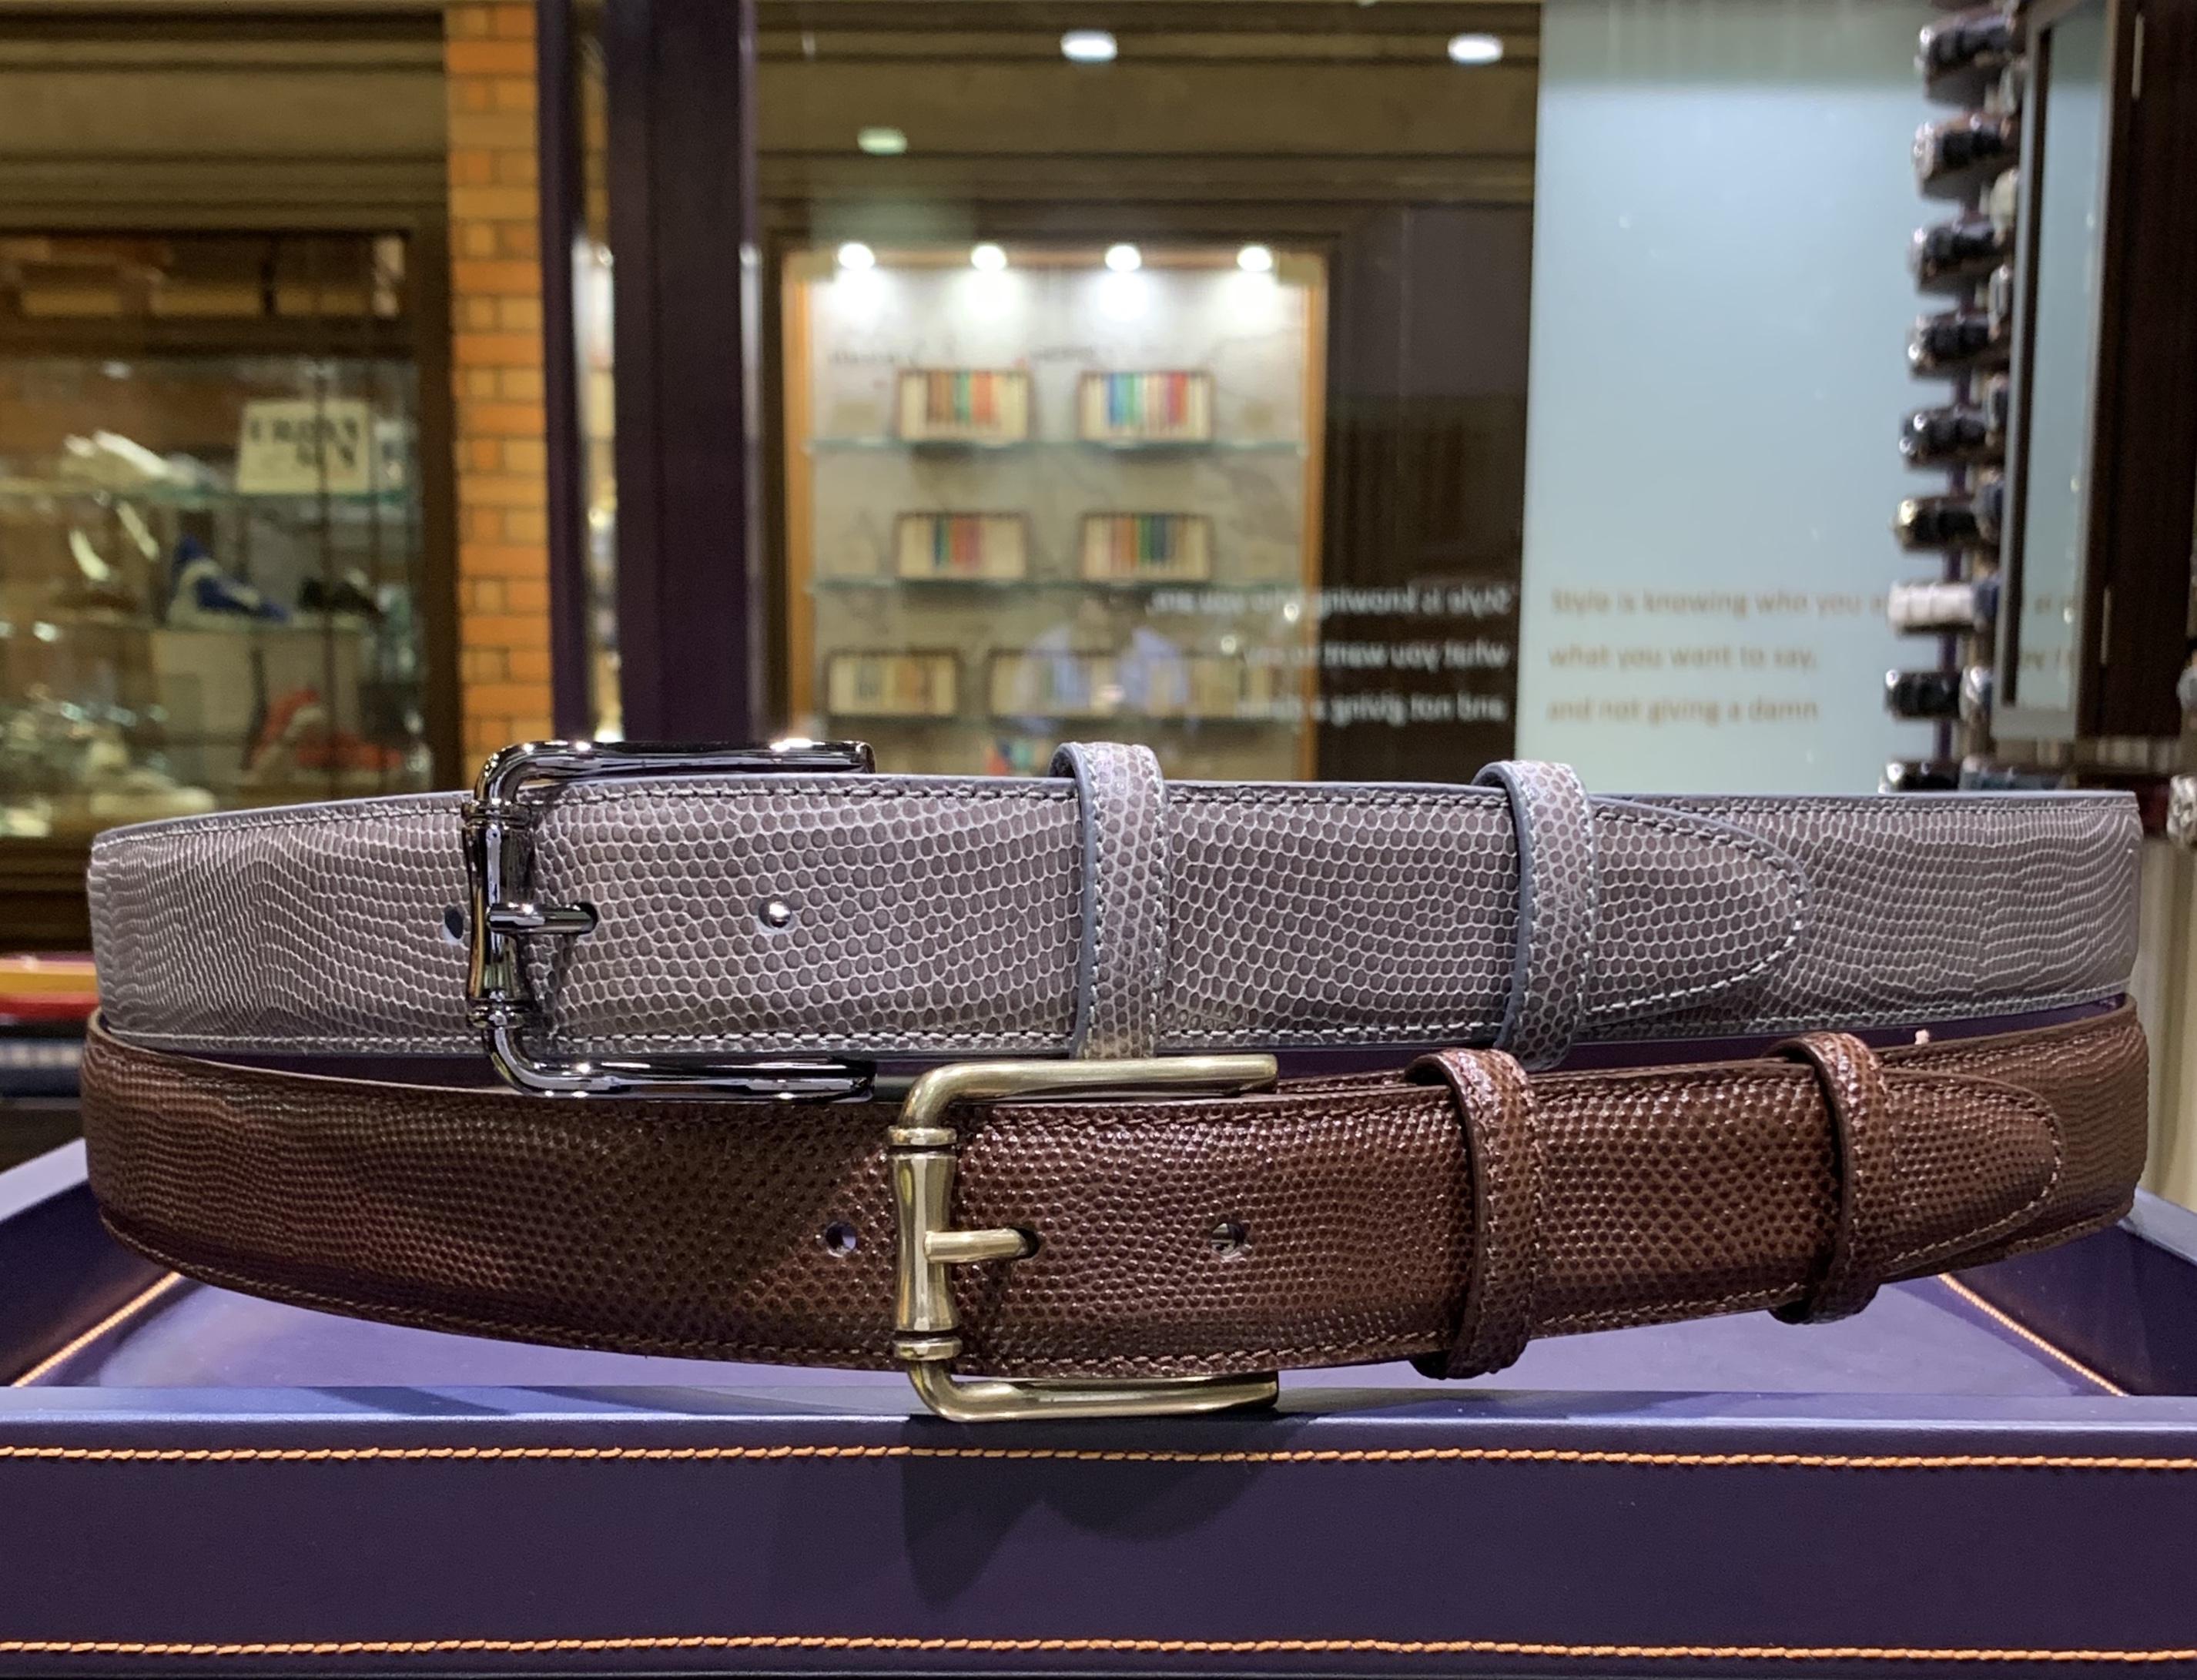 ELLIOT RHODES LONDON CARUNG 35mm